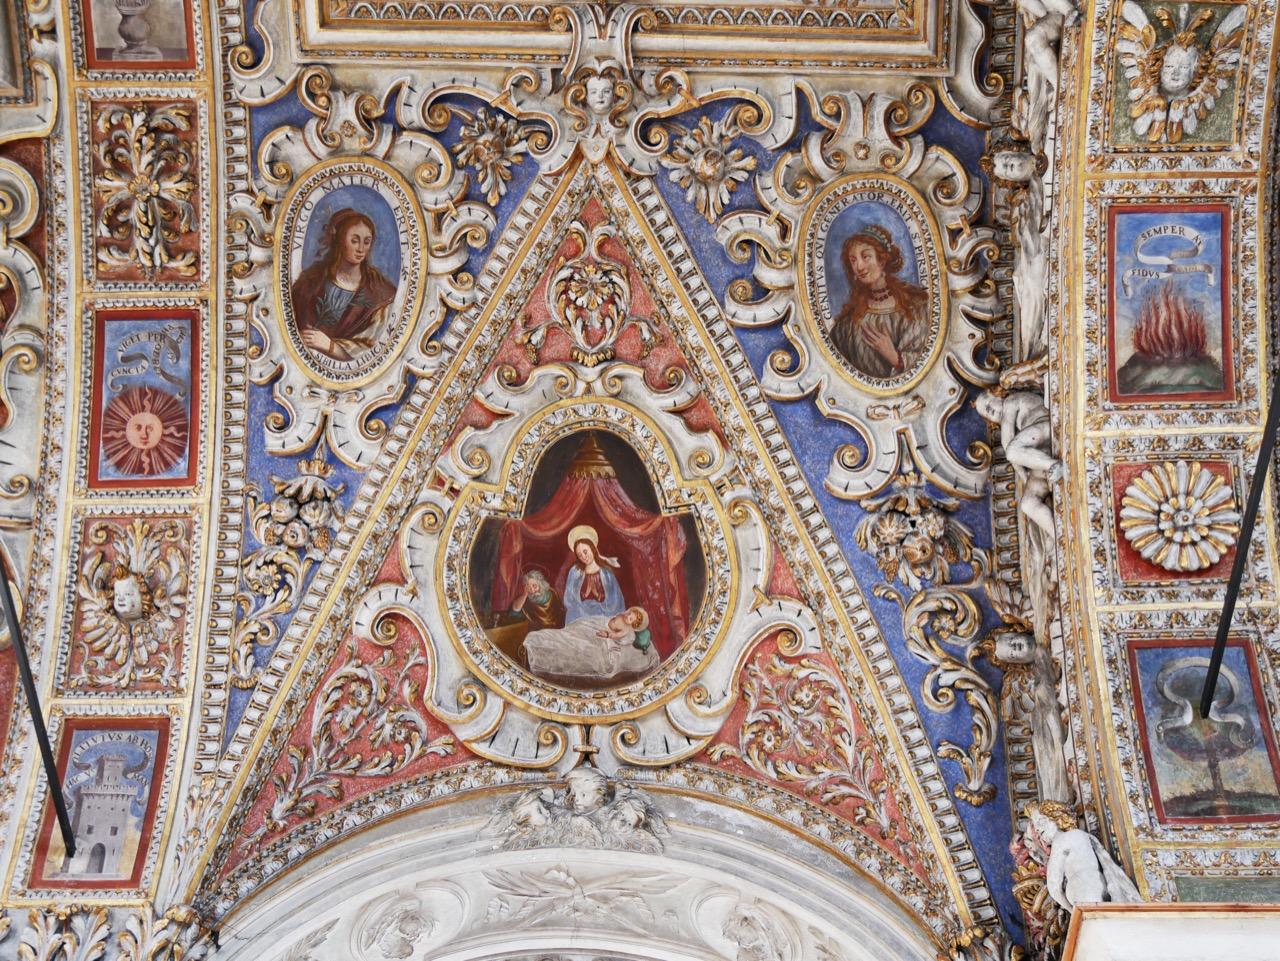 Stuckdecke, Detail (Geburt Jesu)